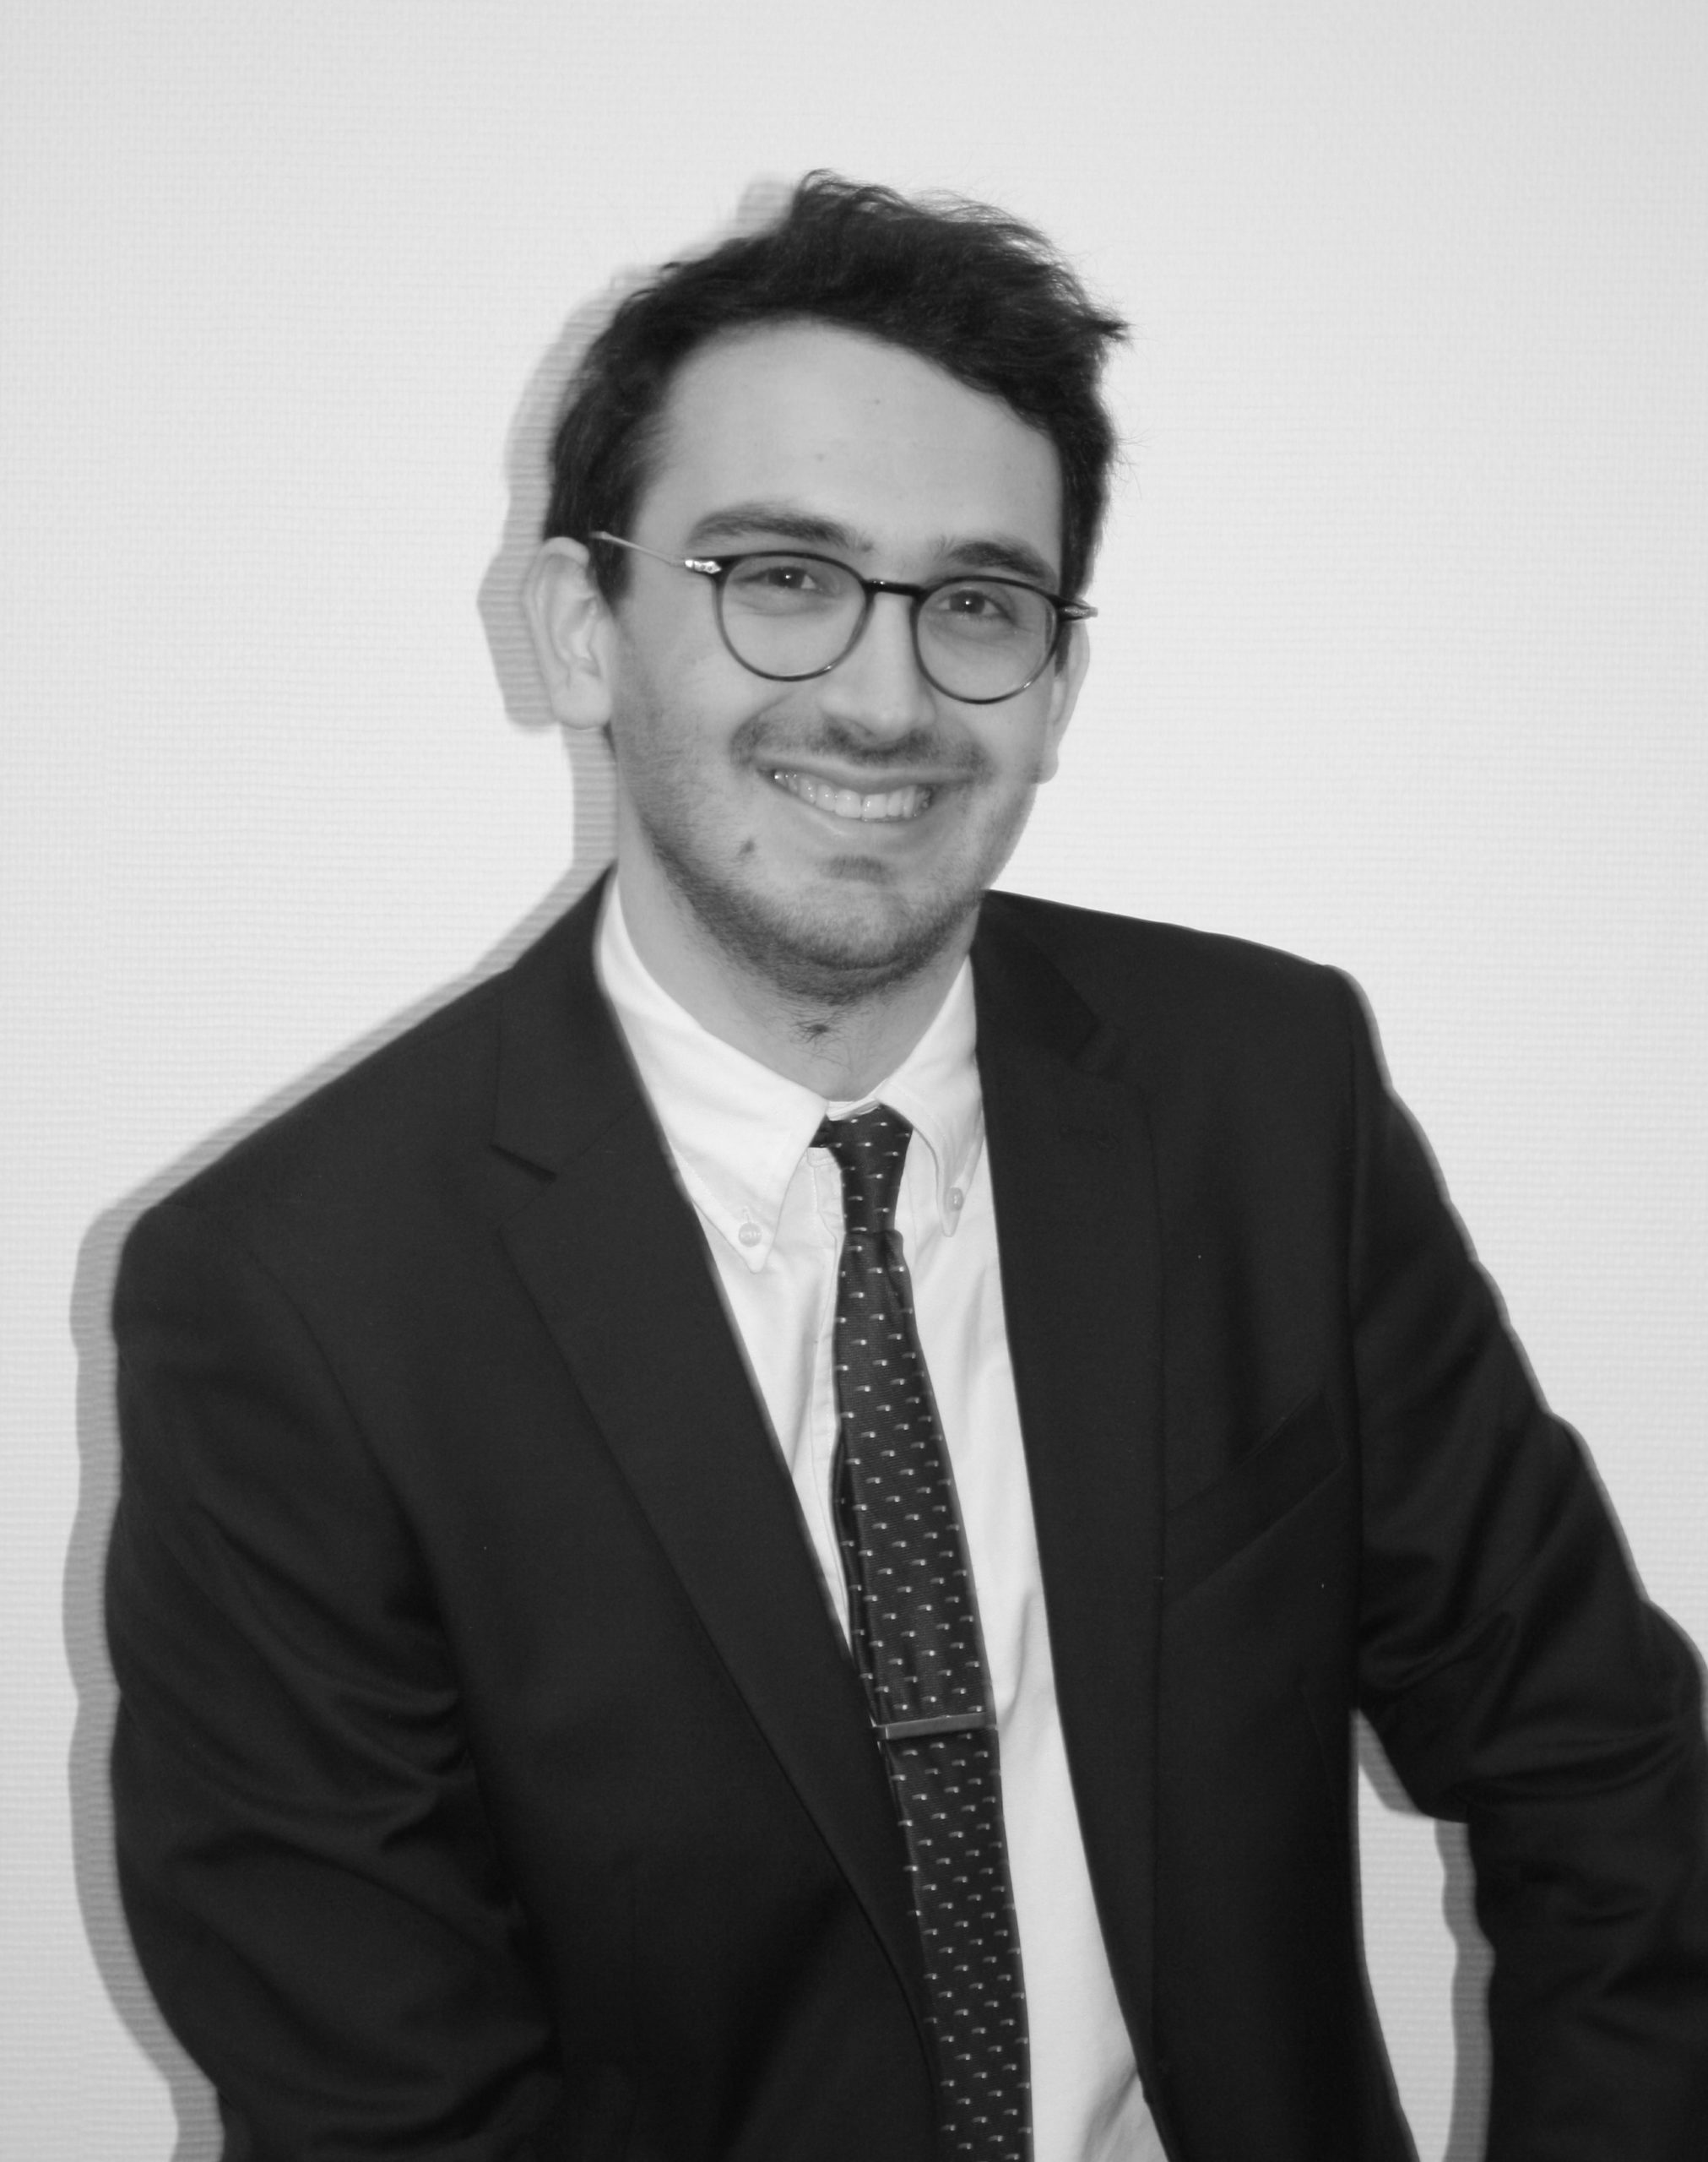 Florian Béchaz